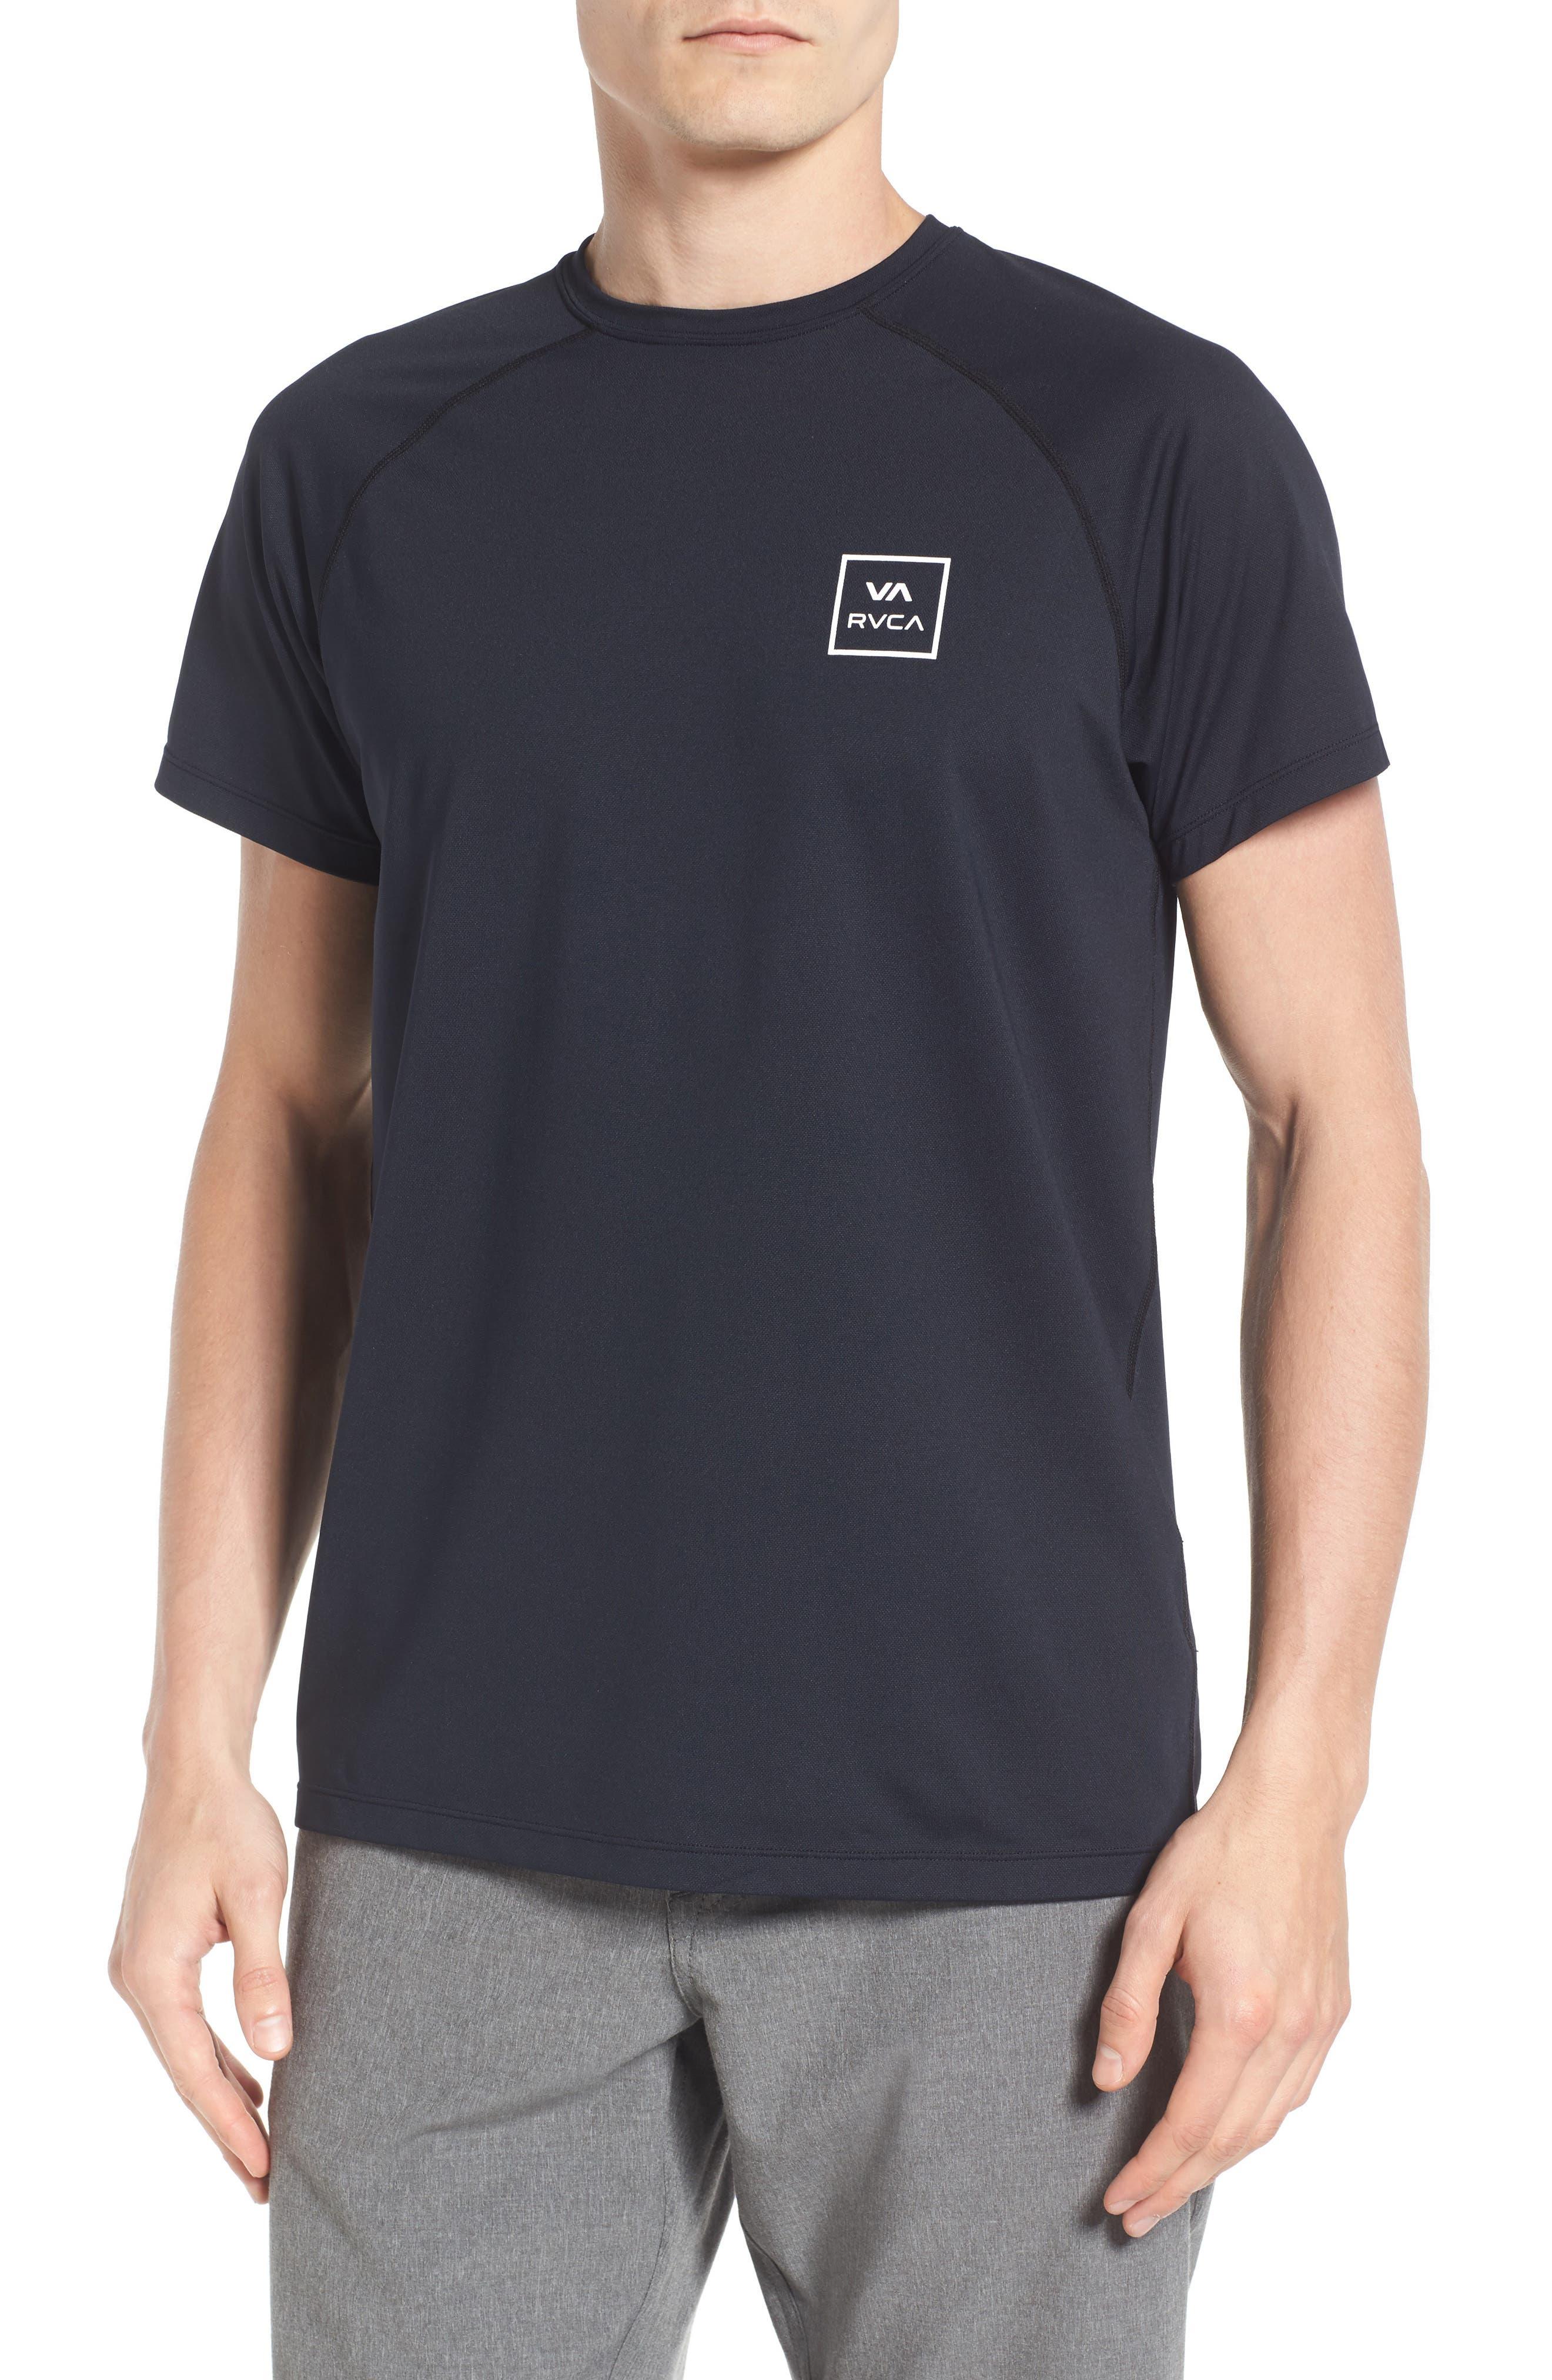 VA All the Way Surf T-Shirt,                         Main,                         color, 001